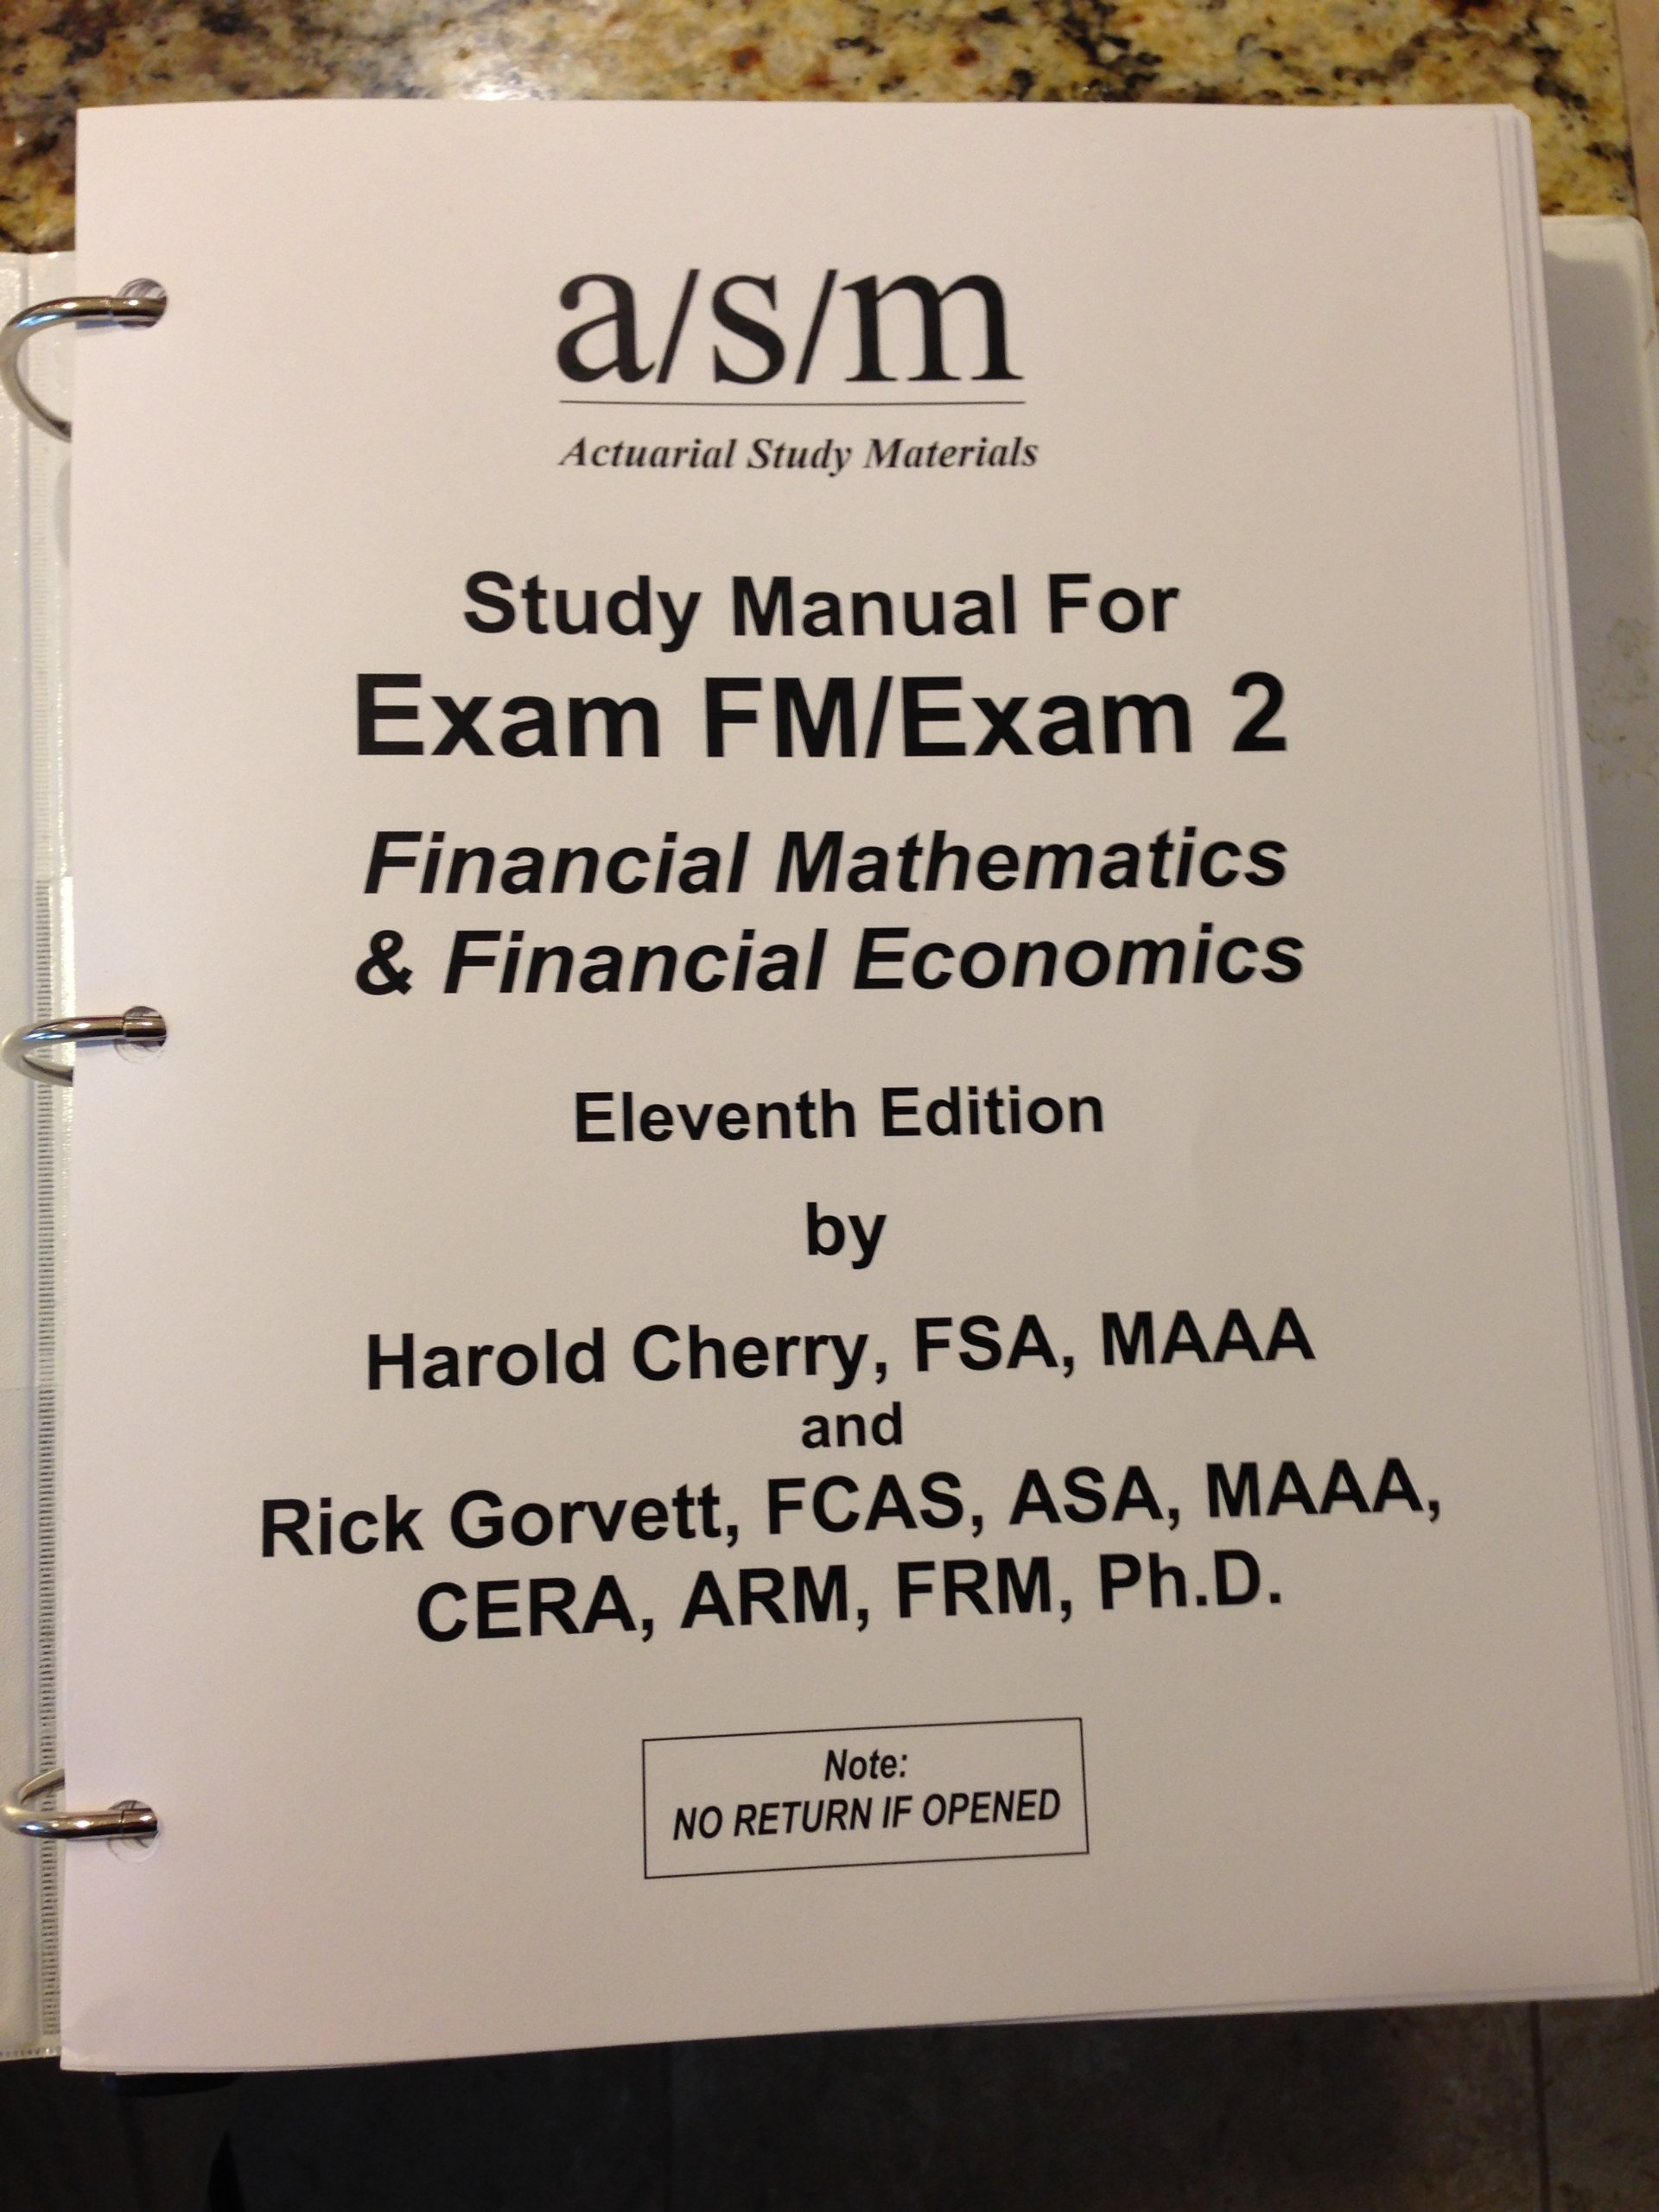 ASM Study Manual for Exam FM/Exam 2: Financial Mathematics & Financial  Economics: Harold Cherry, Rick Gorvett: Amazon.com: Books